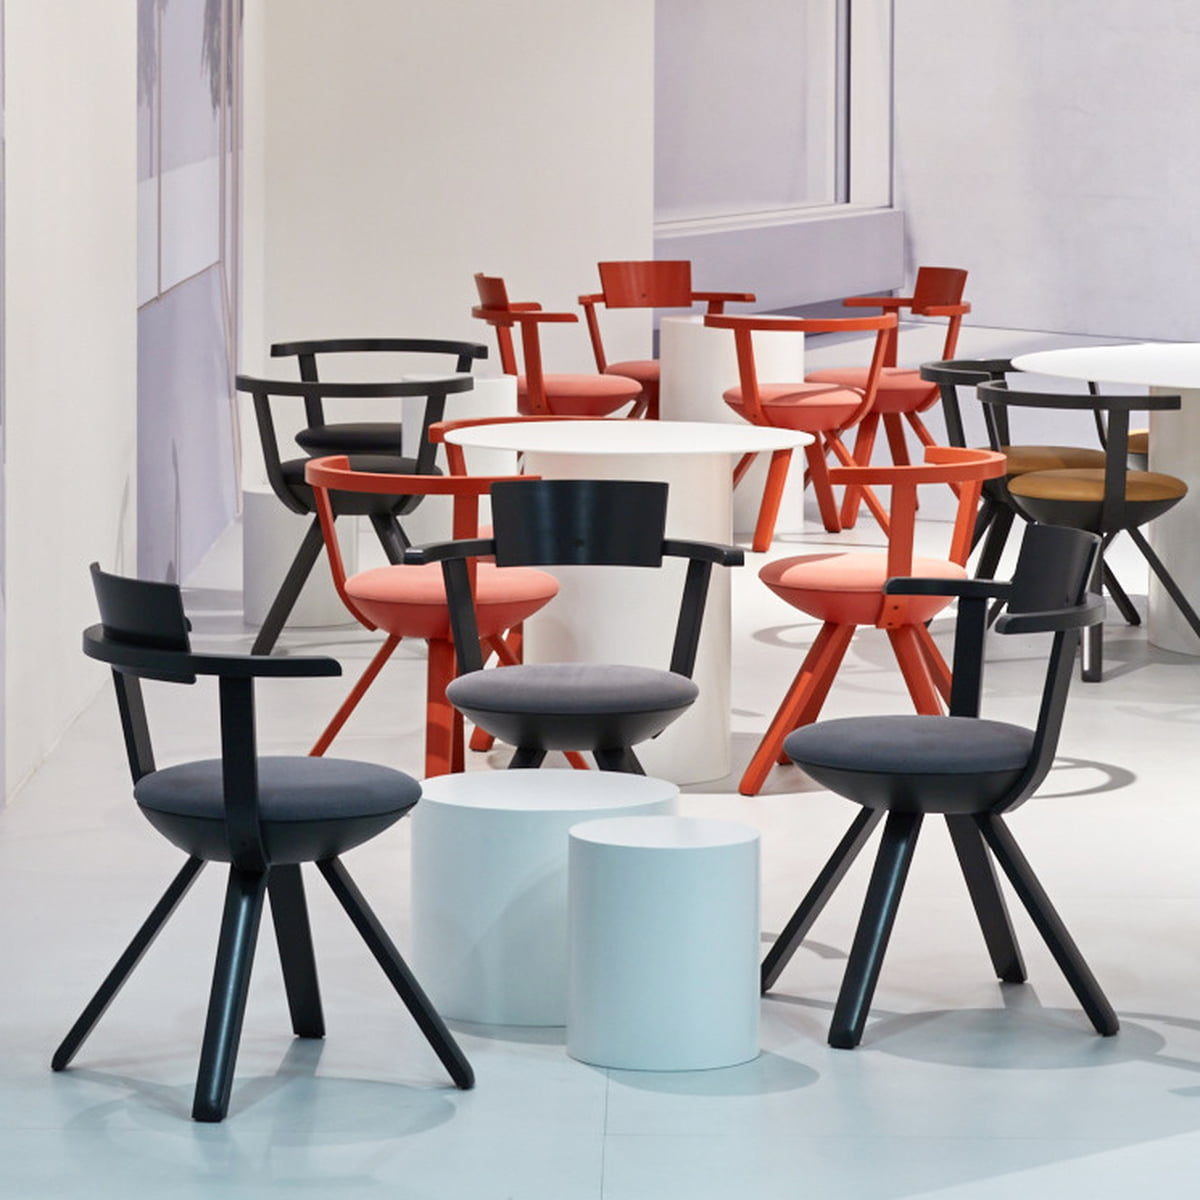 chaise kg 002 rival par artek. Black Bedroom Furniture Sets. Home Design Ideas